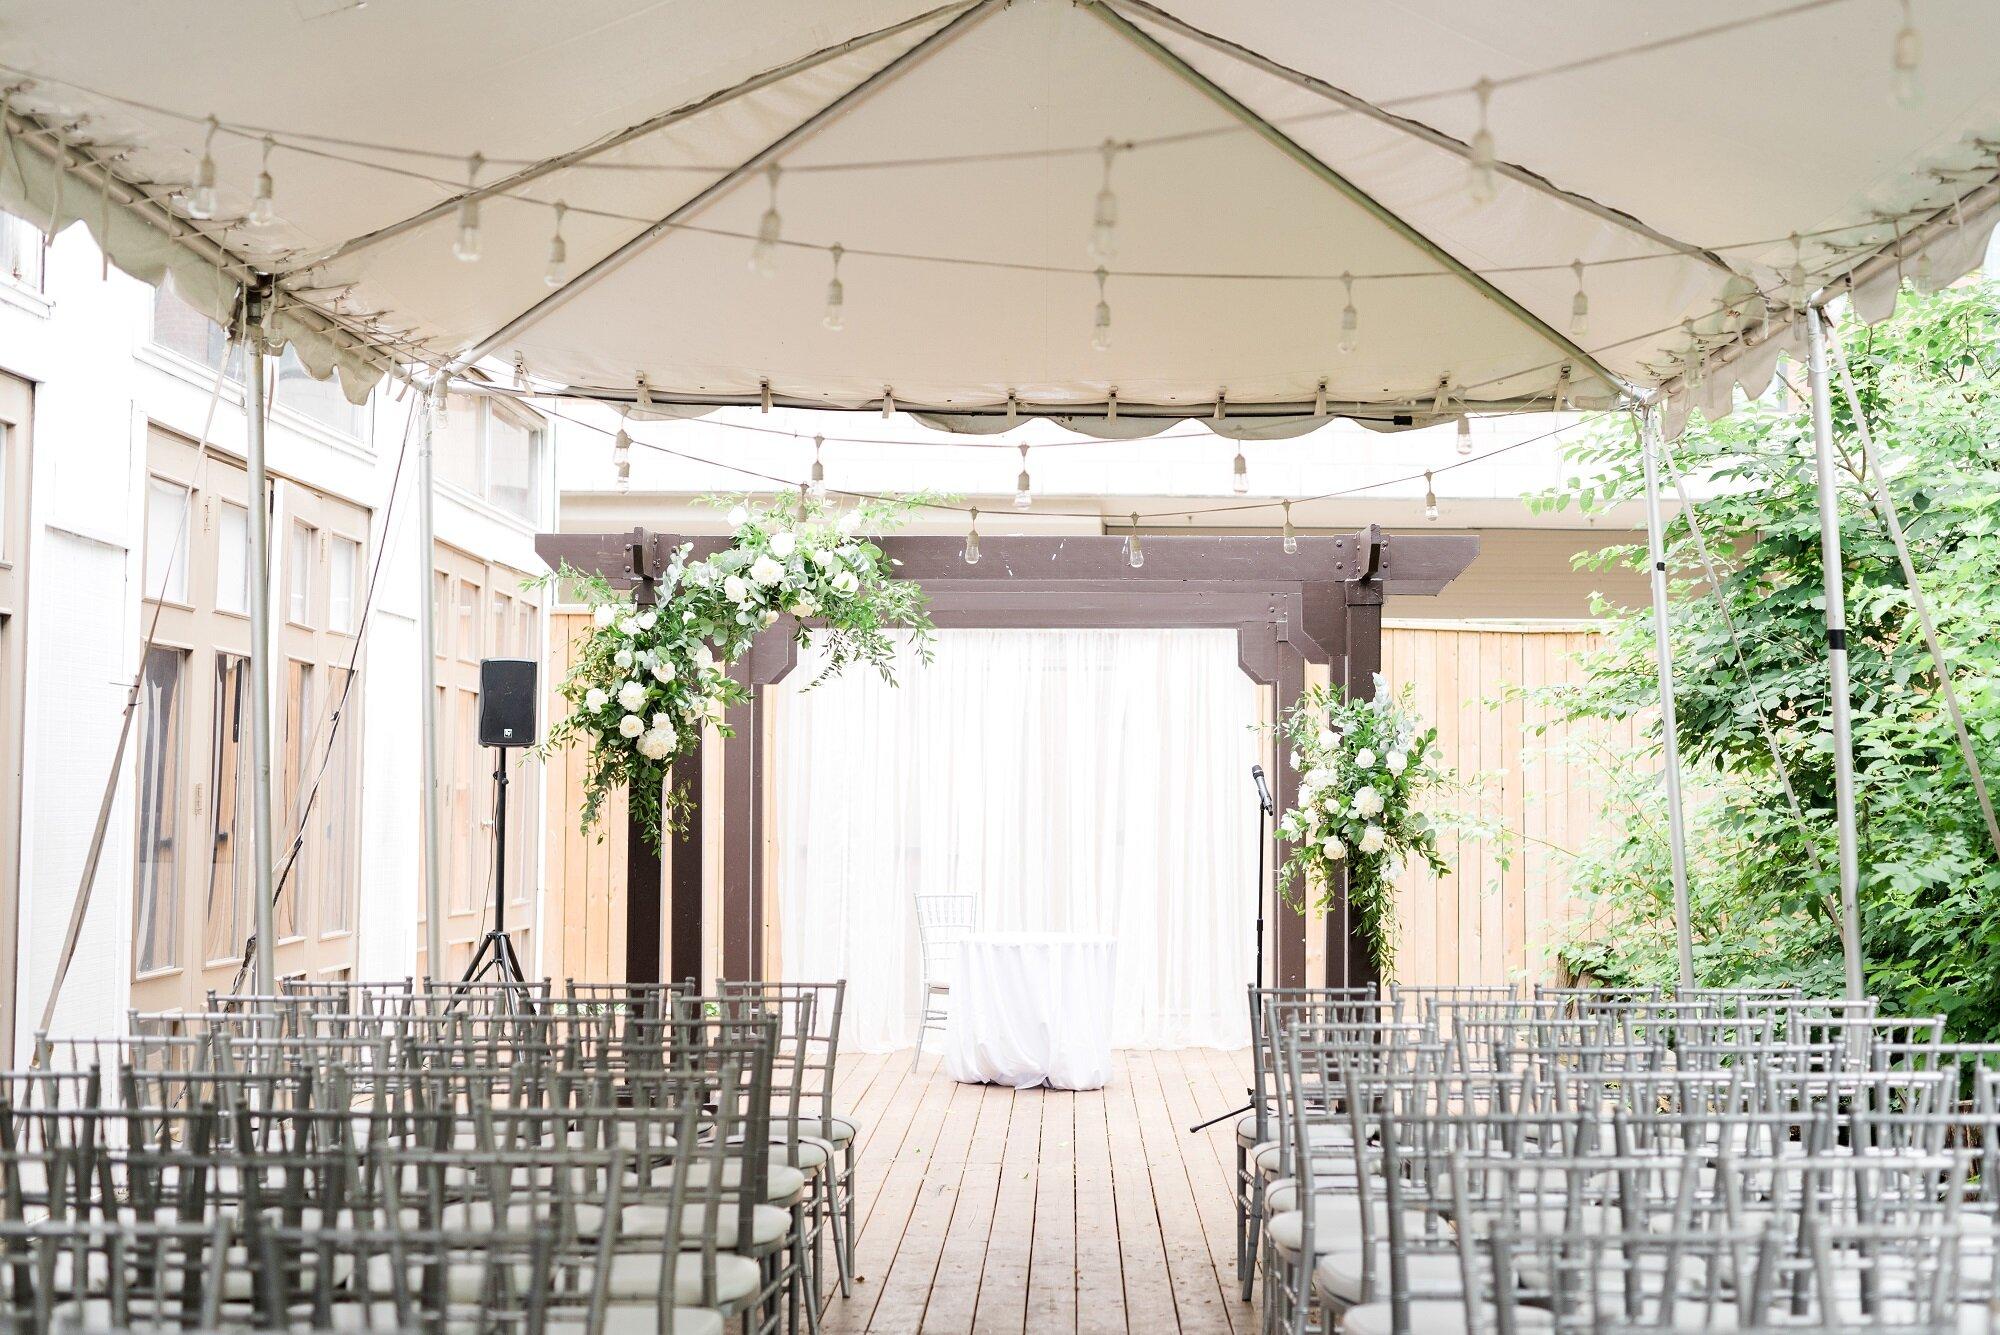 berkeley-field-house-wedding-kj-and-co-17.jpg